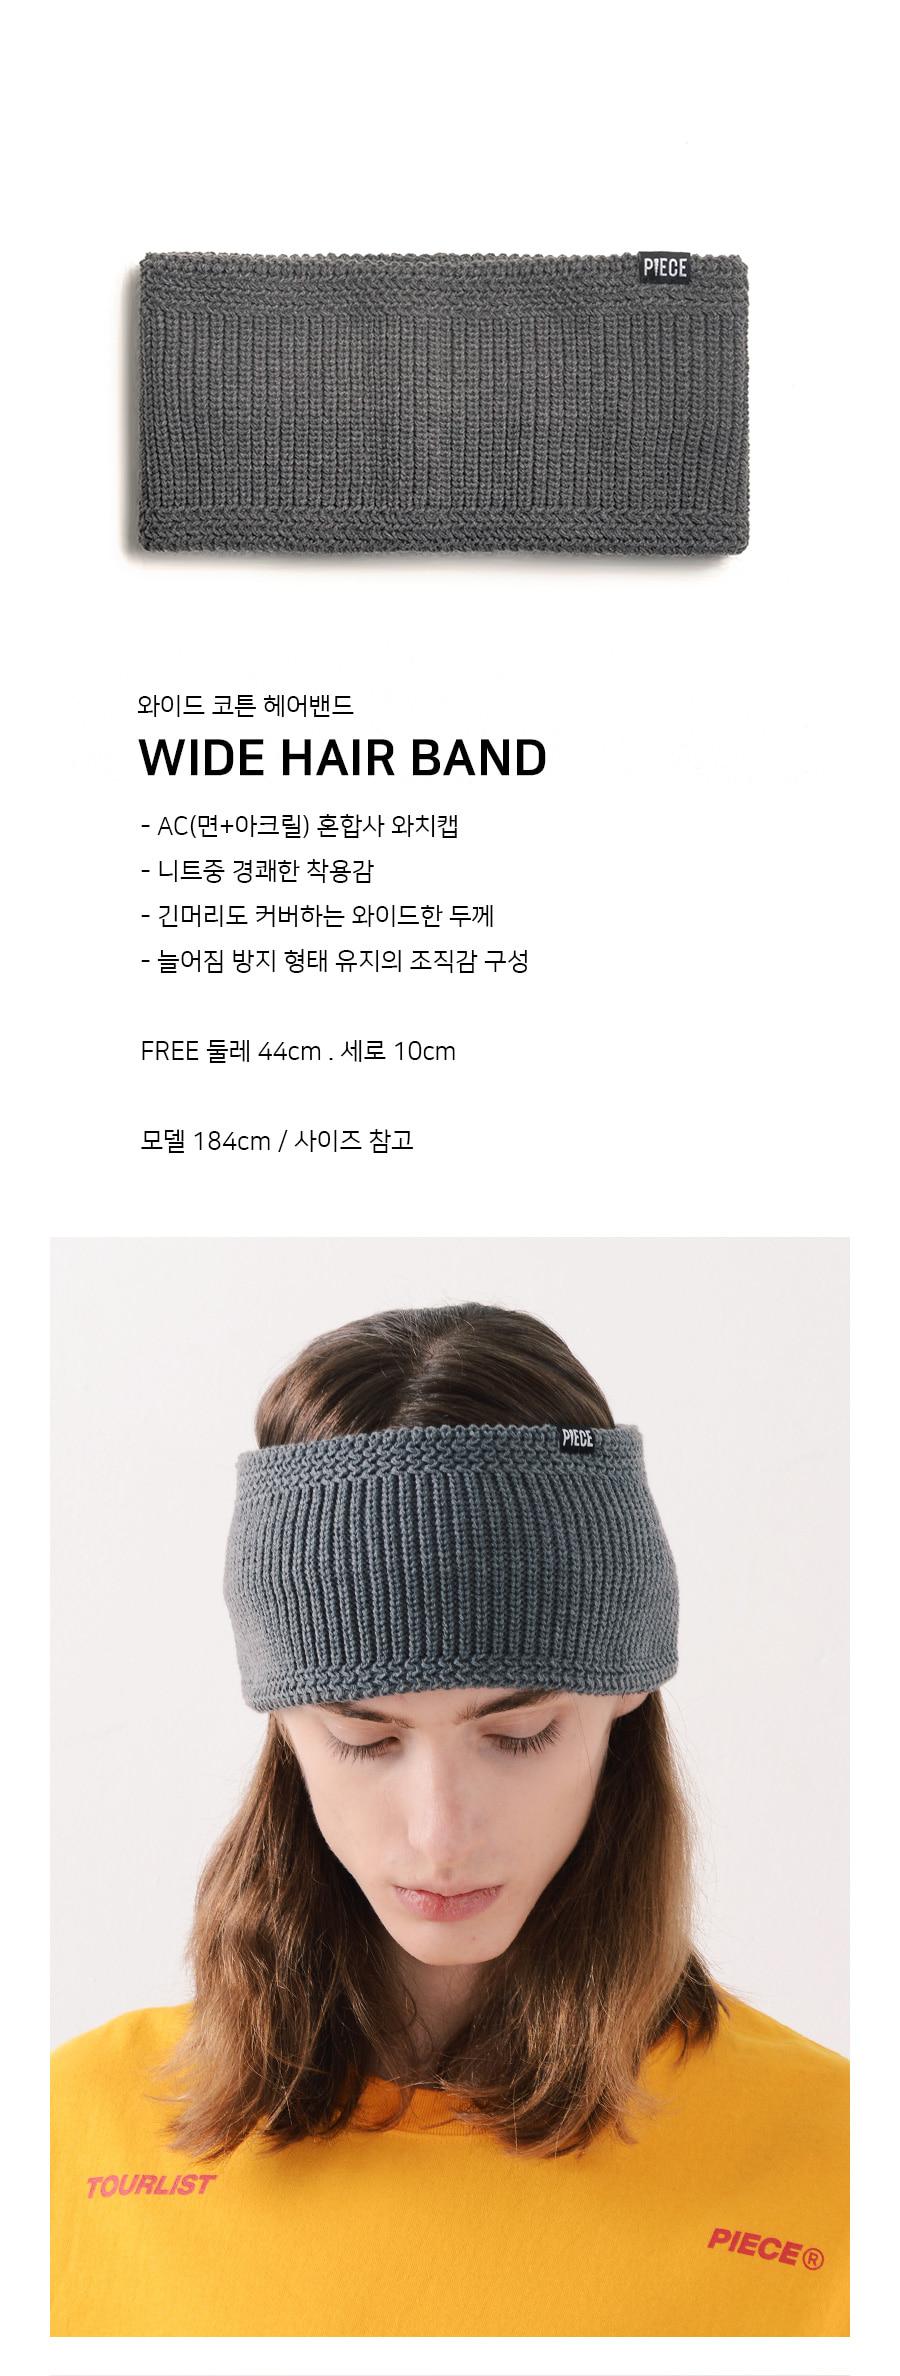 WIDE HAIR BAND (CHARCOAL)